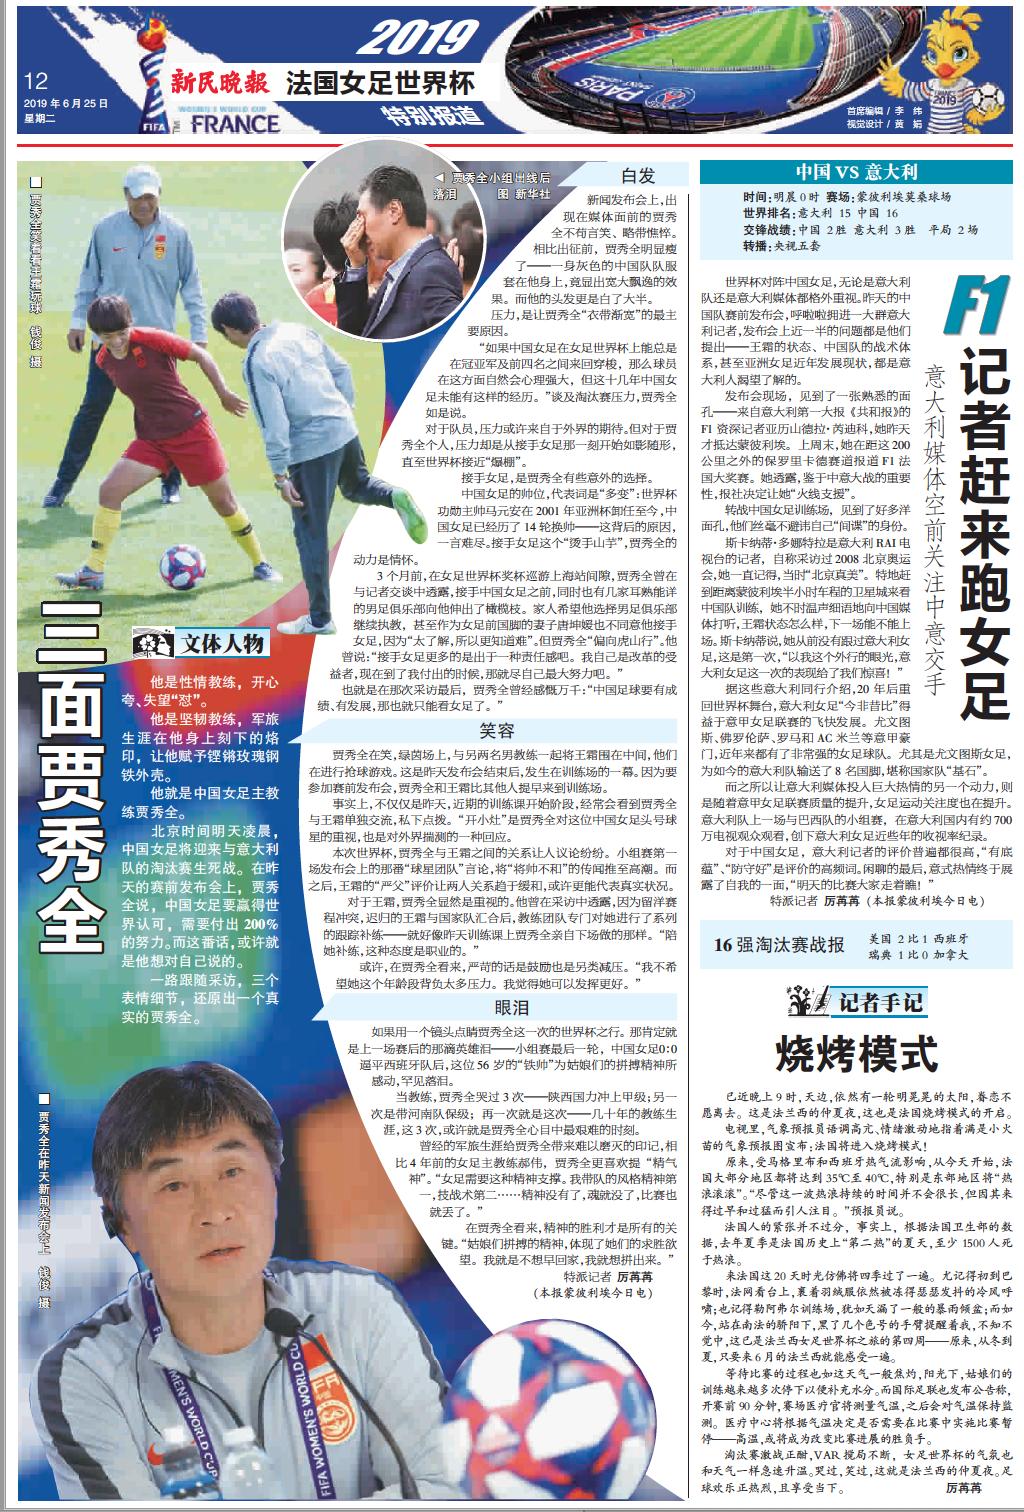 XINMIN EVENING NEWS_20190625_FIFAWWC_PIC